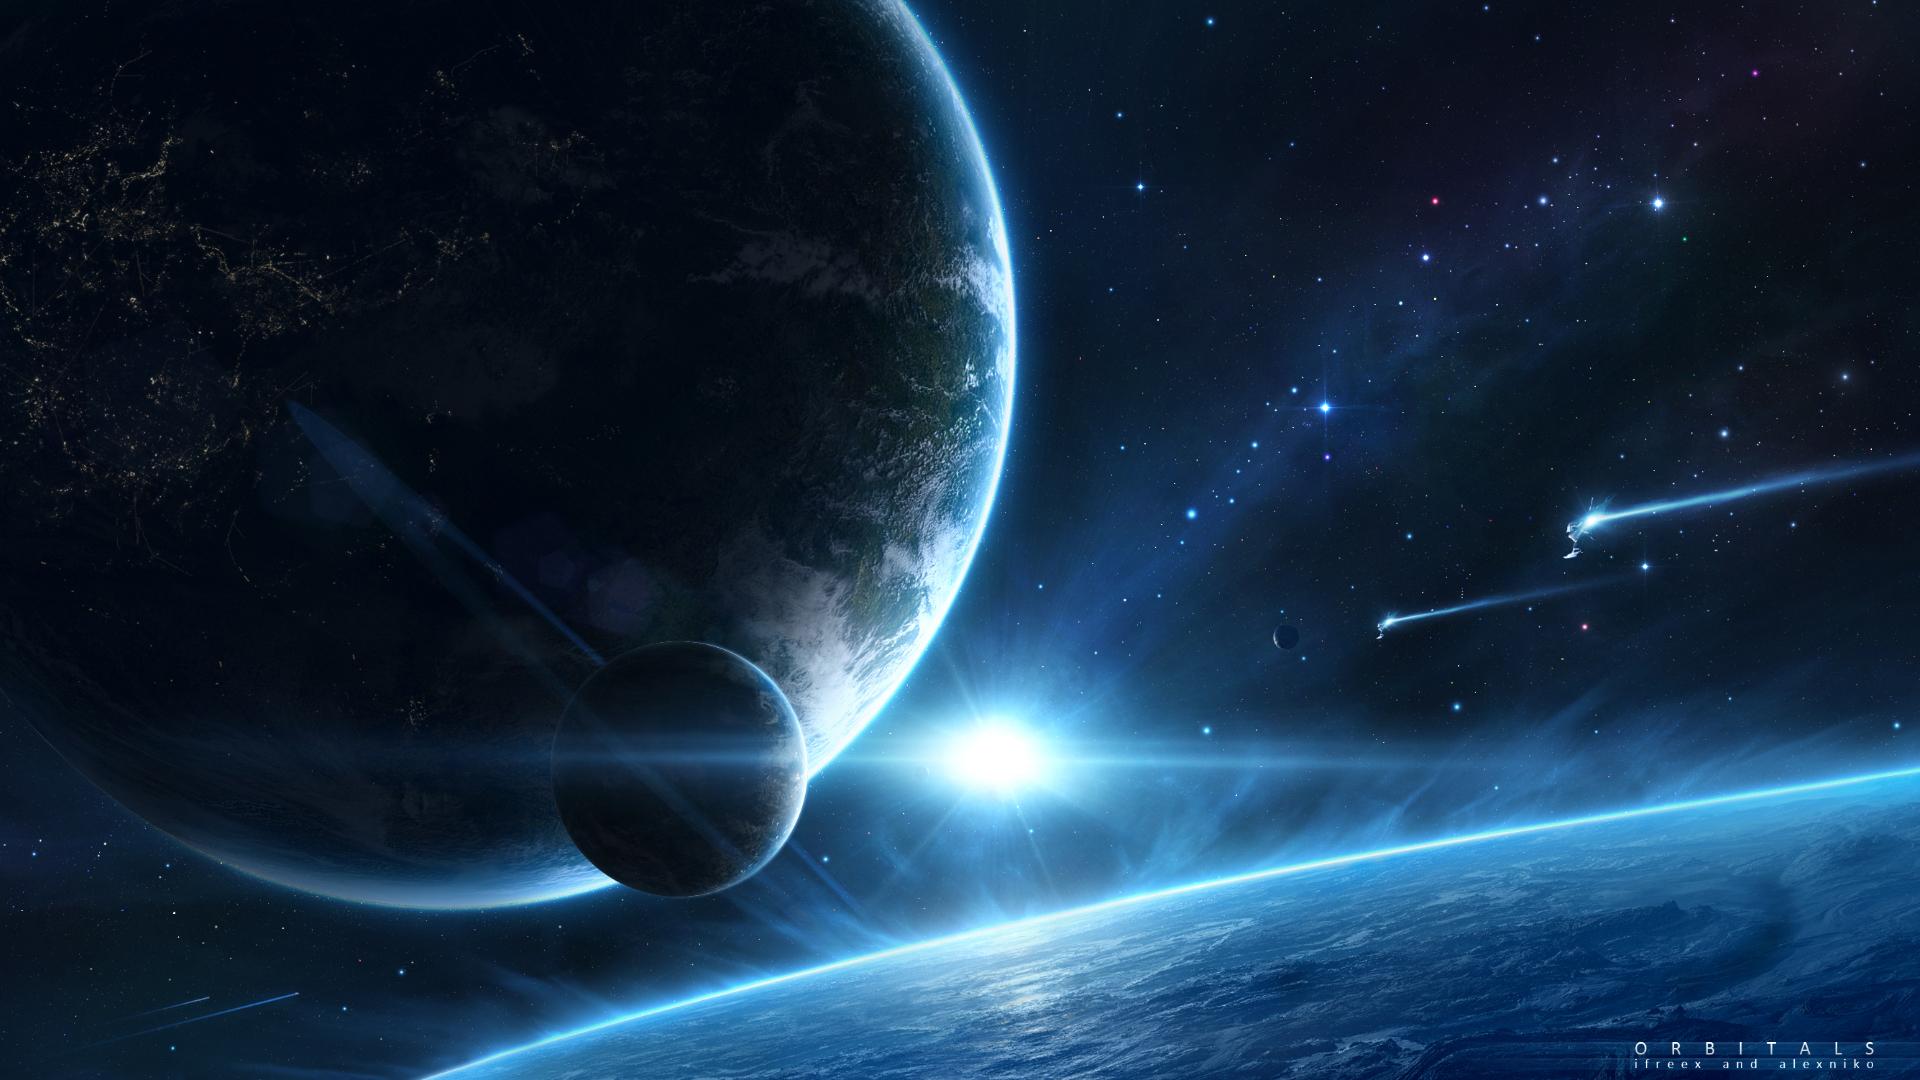 image - space fantasy hd wallpaper-34 jpg orbitals 1920x1080